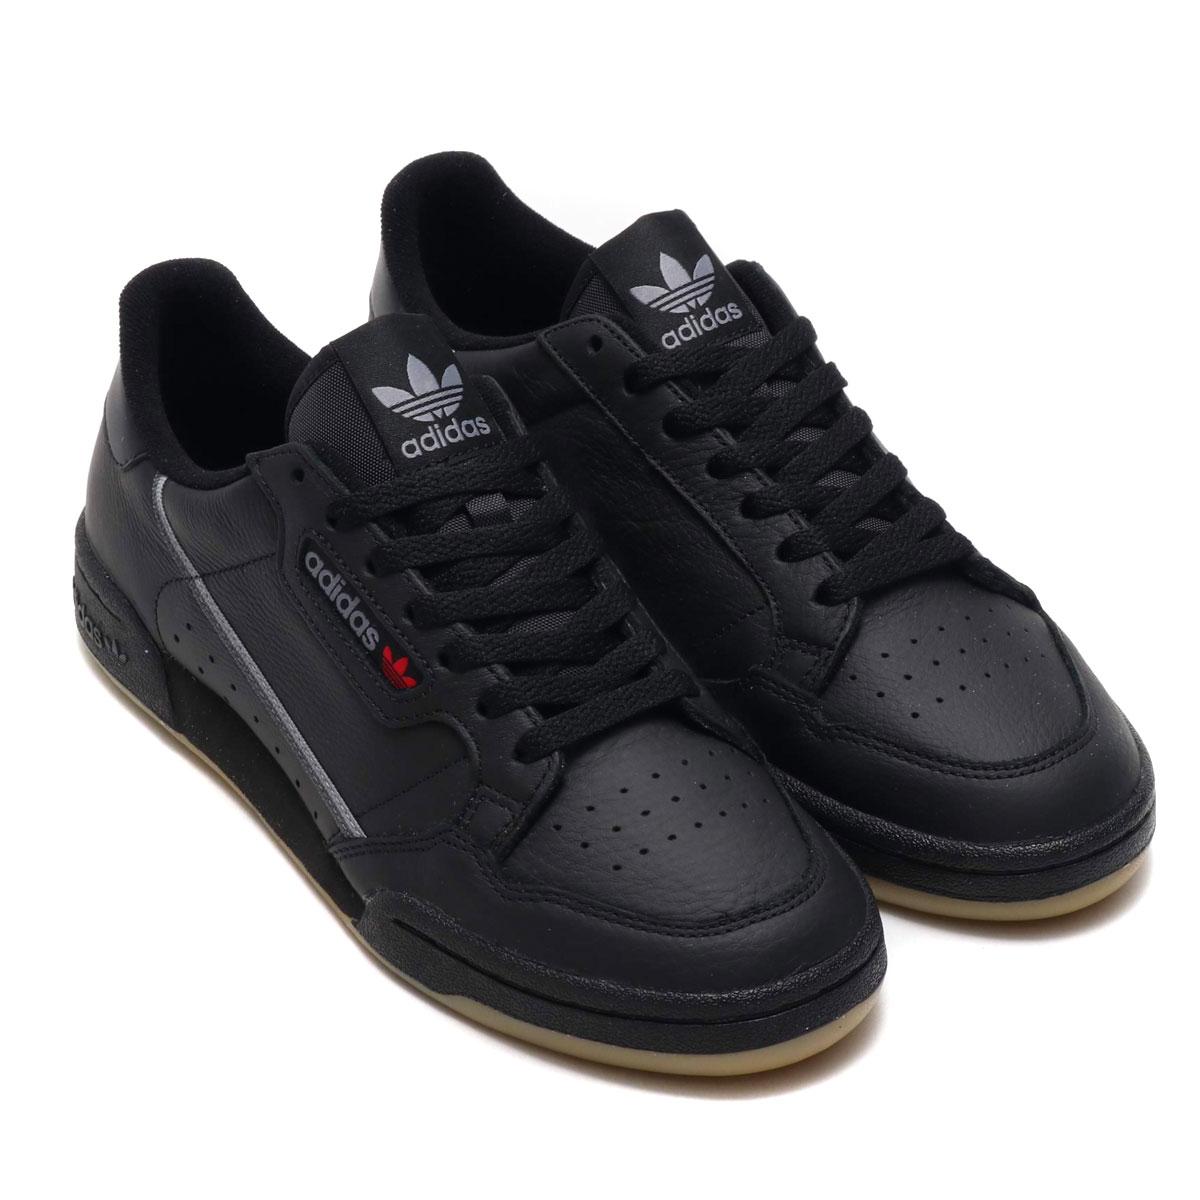 adidas Originals CONTINENTAL 80(アディダスオリジナルス コンチネンタル 80)CORE BLACK/GREY THREE/GUM【メンズ スニーカー】19SS-I